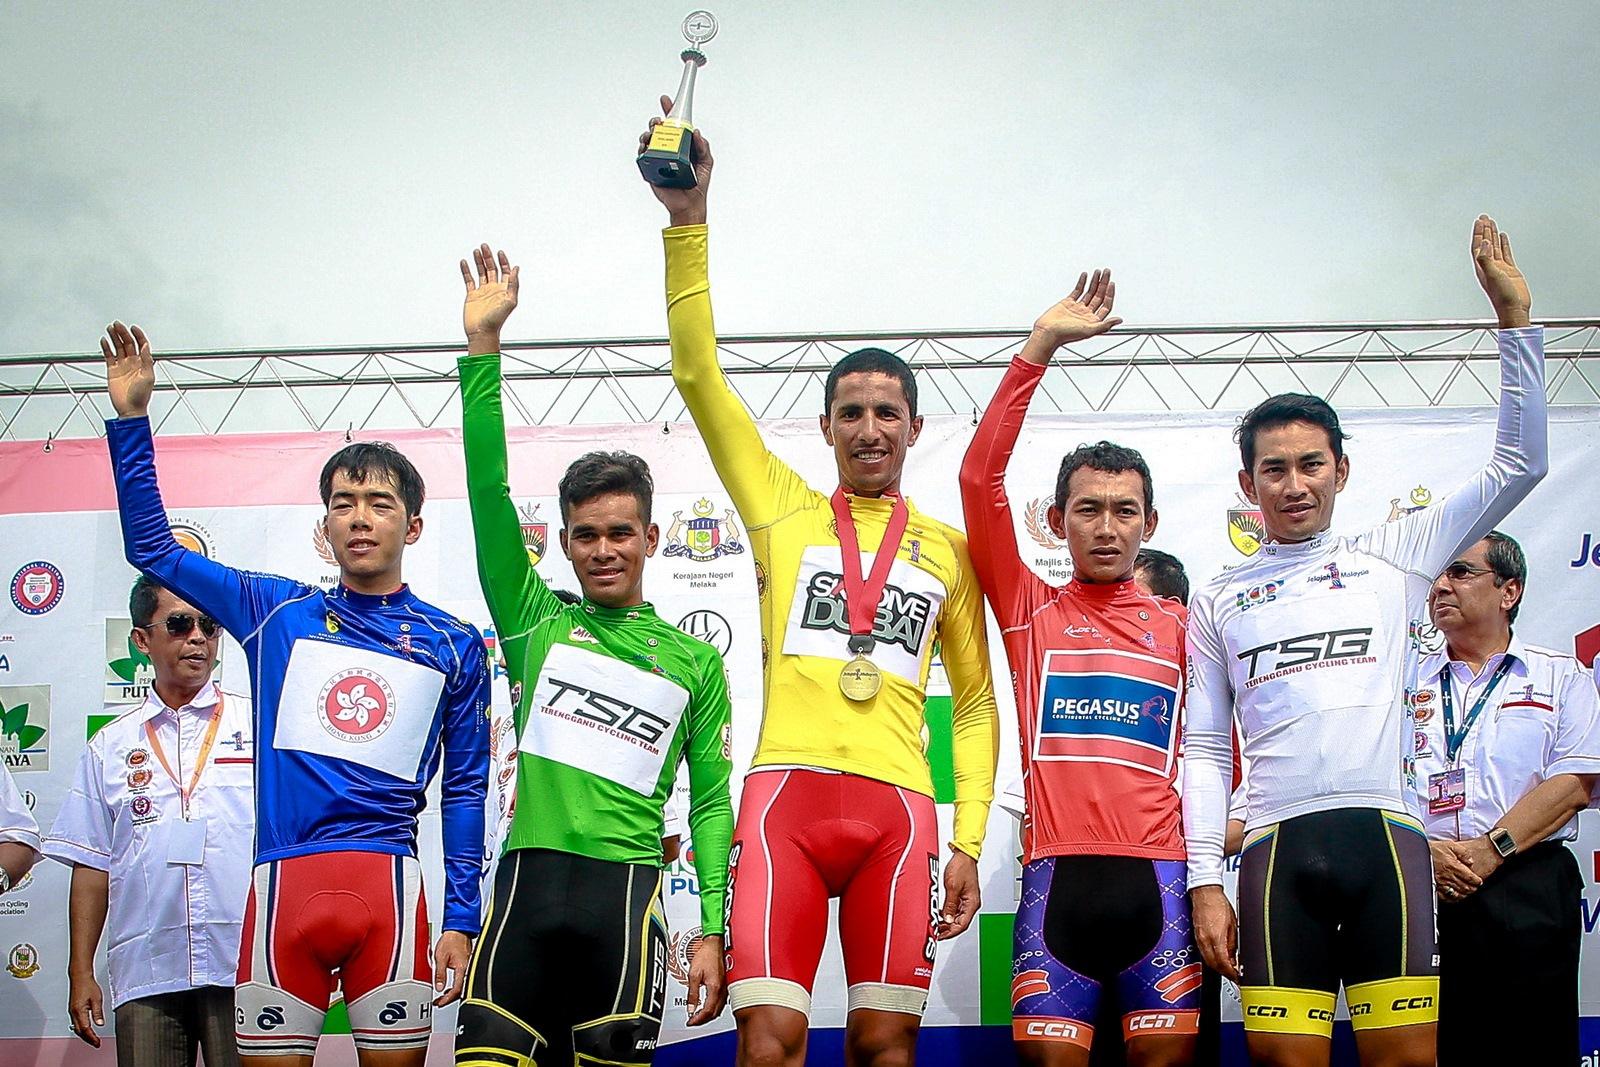 Jelajah Malaysia 2014 - Final Stage - Winner